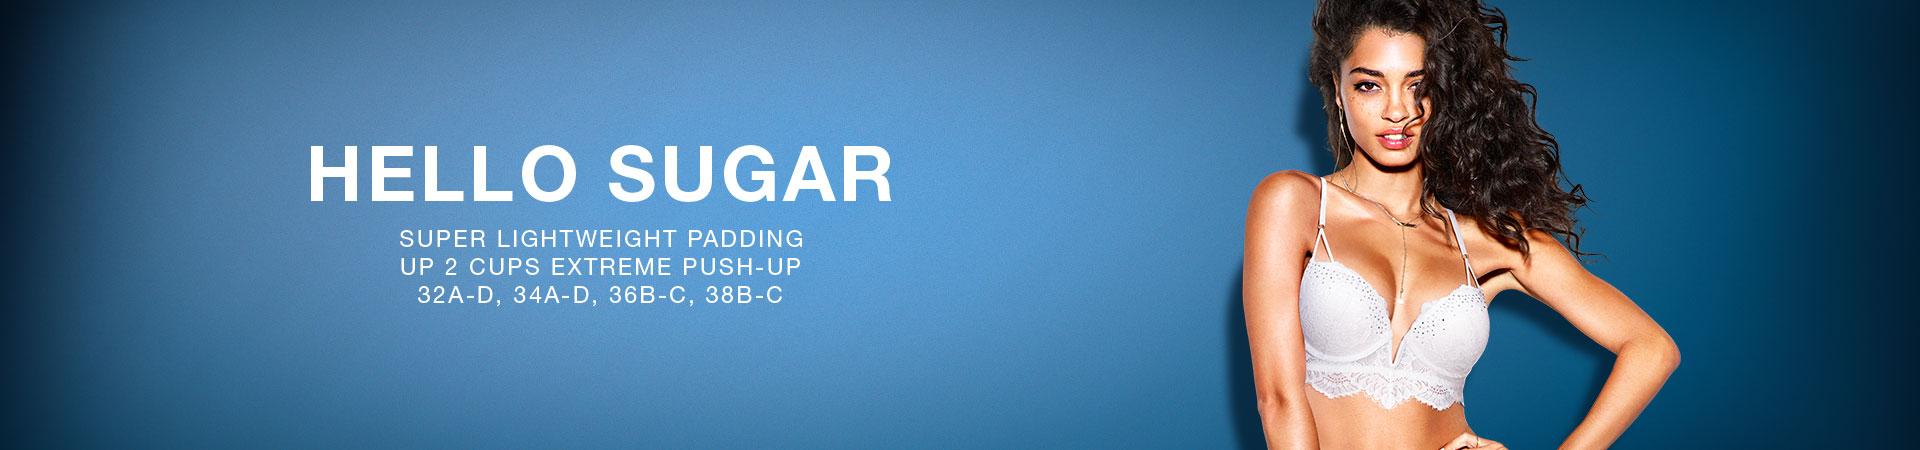 Hello Sugar. Super lightweight padding. Up 2 cups extreme push-up. 32A-D, 34A-D, 36B-C, 38B-C.